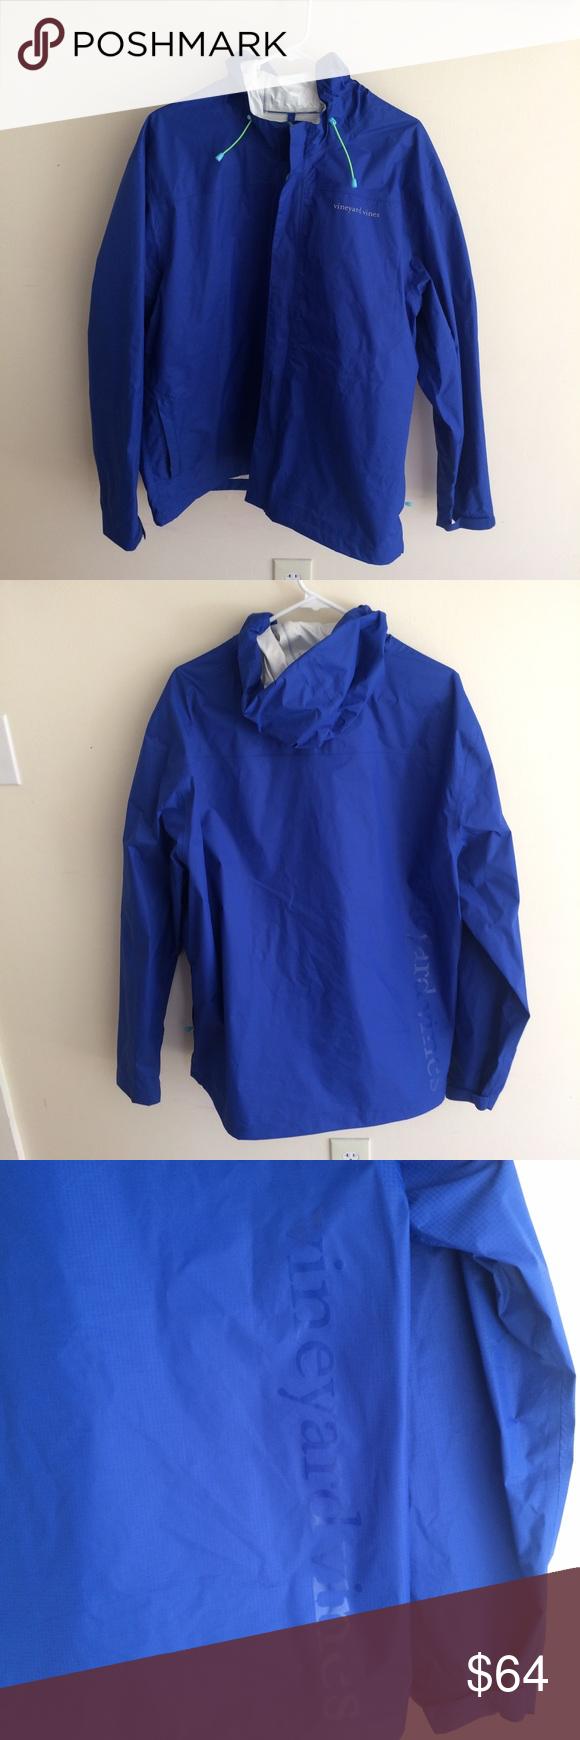 Menus vineyard vines beacon zip rain jacket rain jacket raincoat